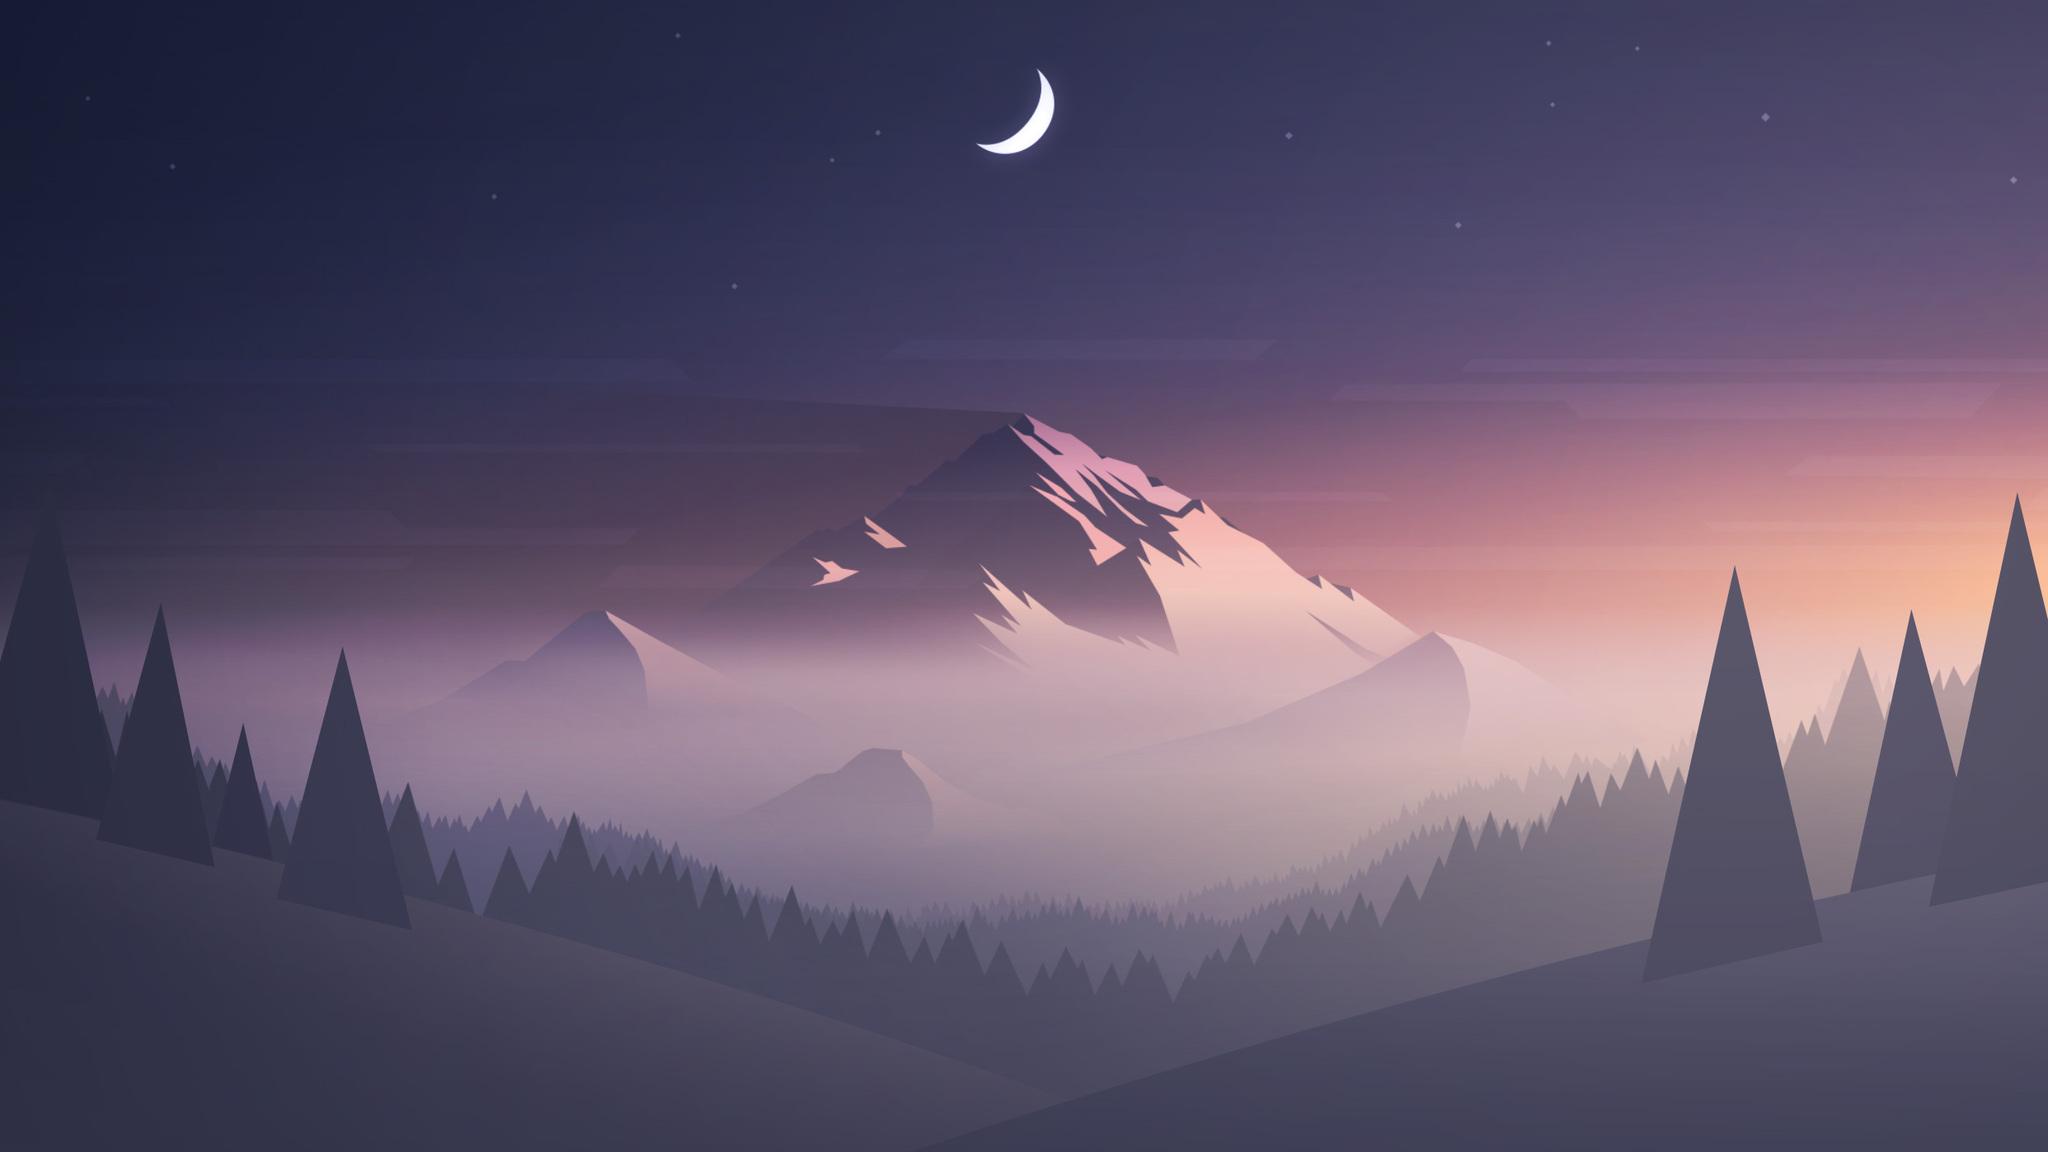 Simple Wallpaper Mountain Minimalistic - mountains-moon-trees-minimalism-hd-2048x1152  Photograph_624334.jpg